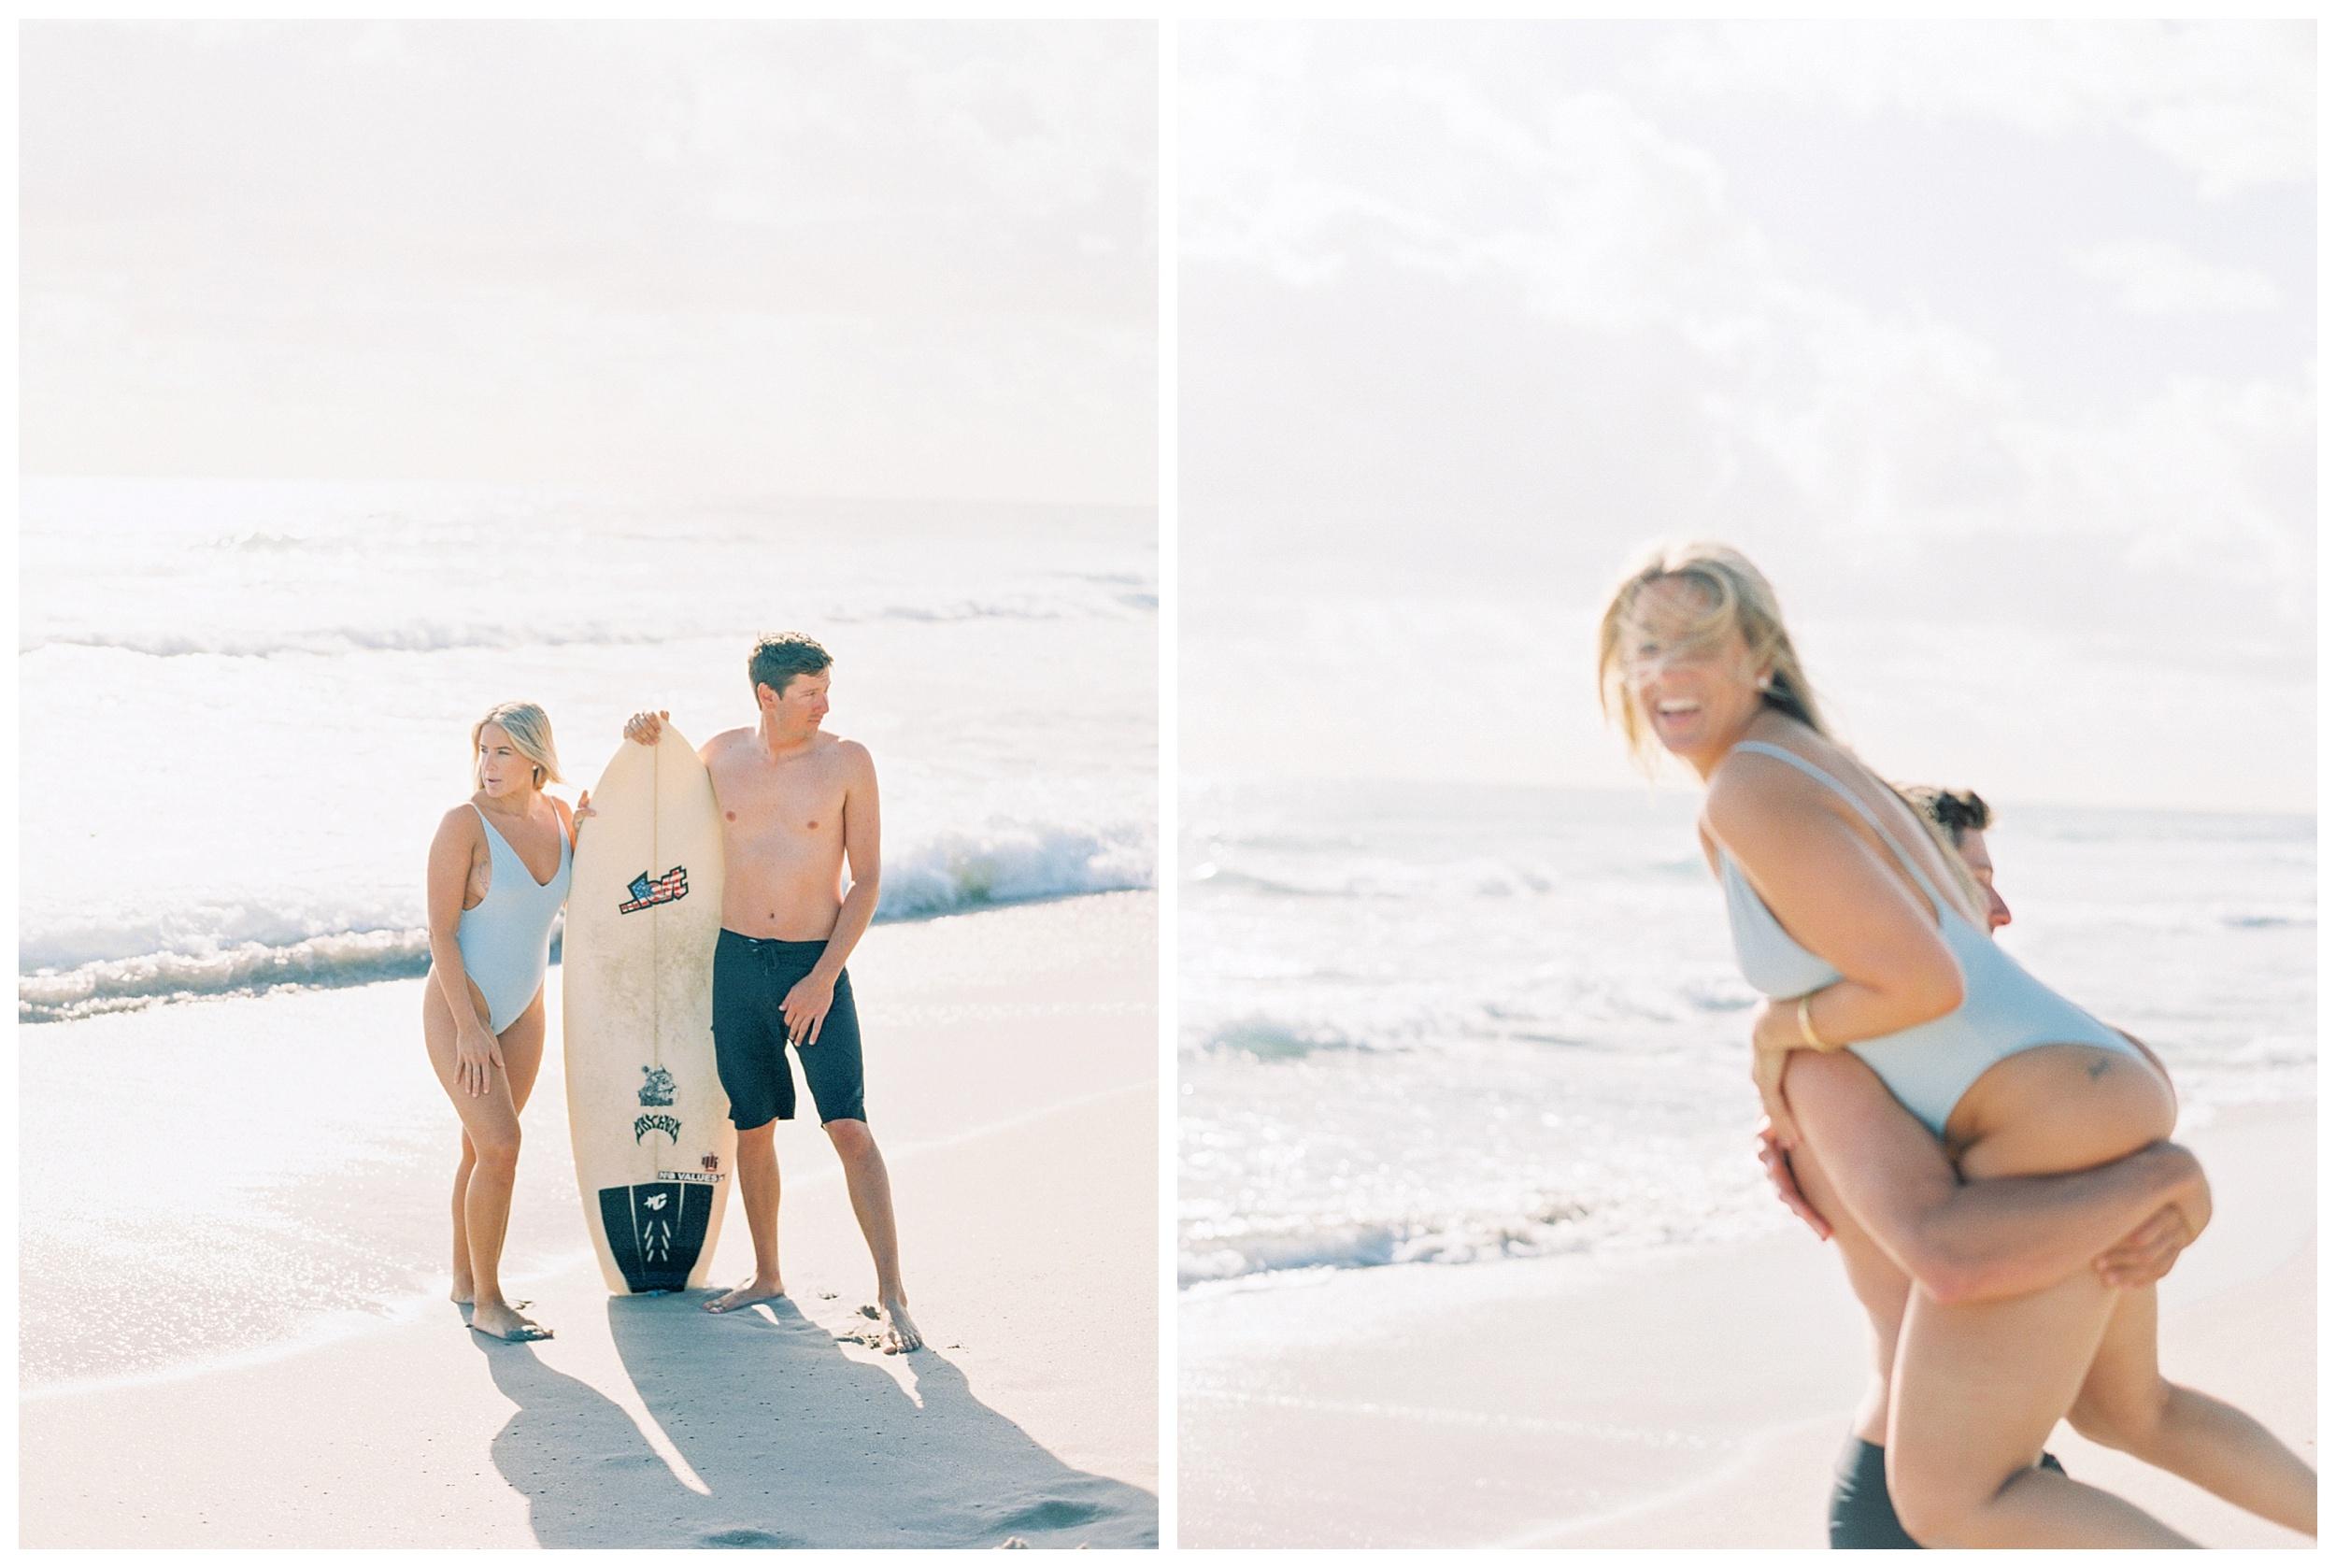 Surfboard Engagement Florida Wedding Photographer Kir Tuben_0018.jpg